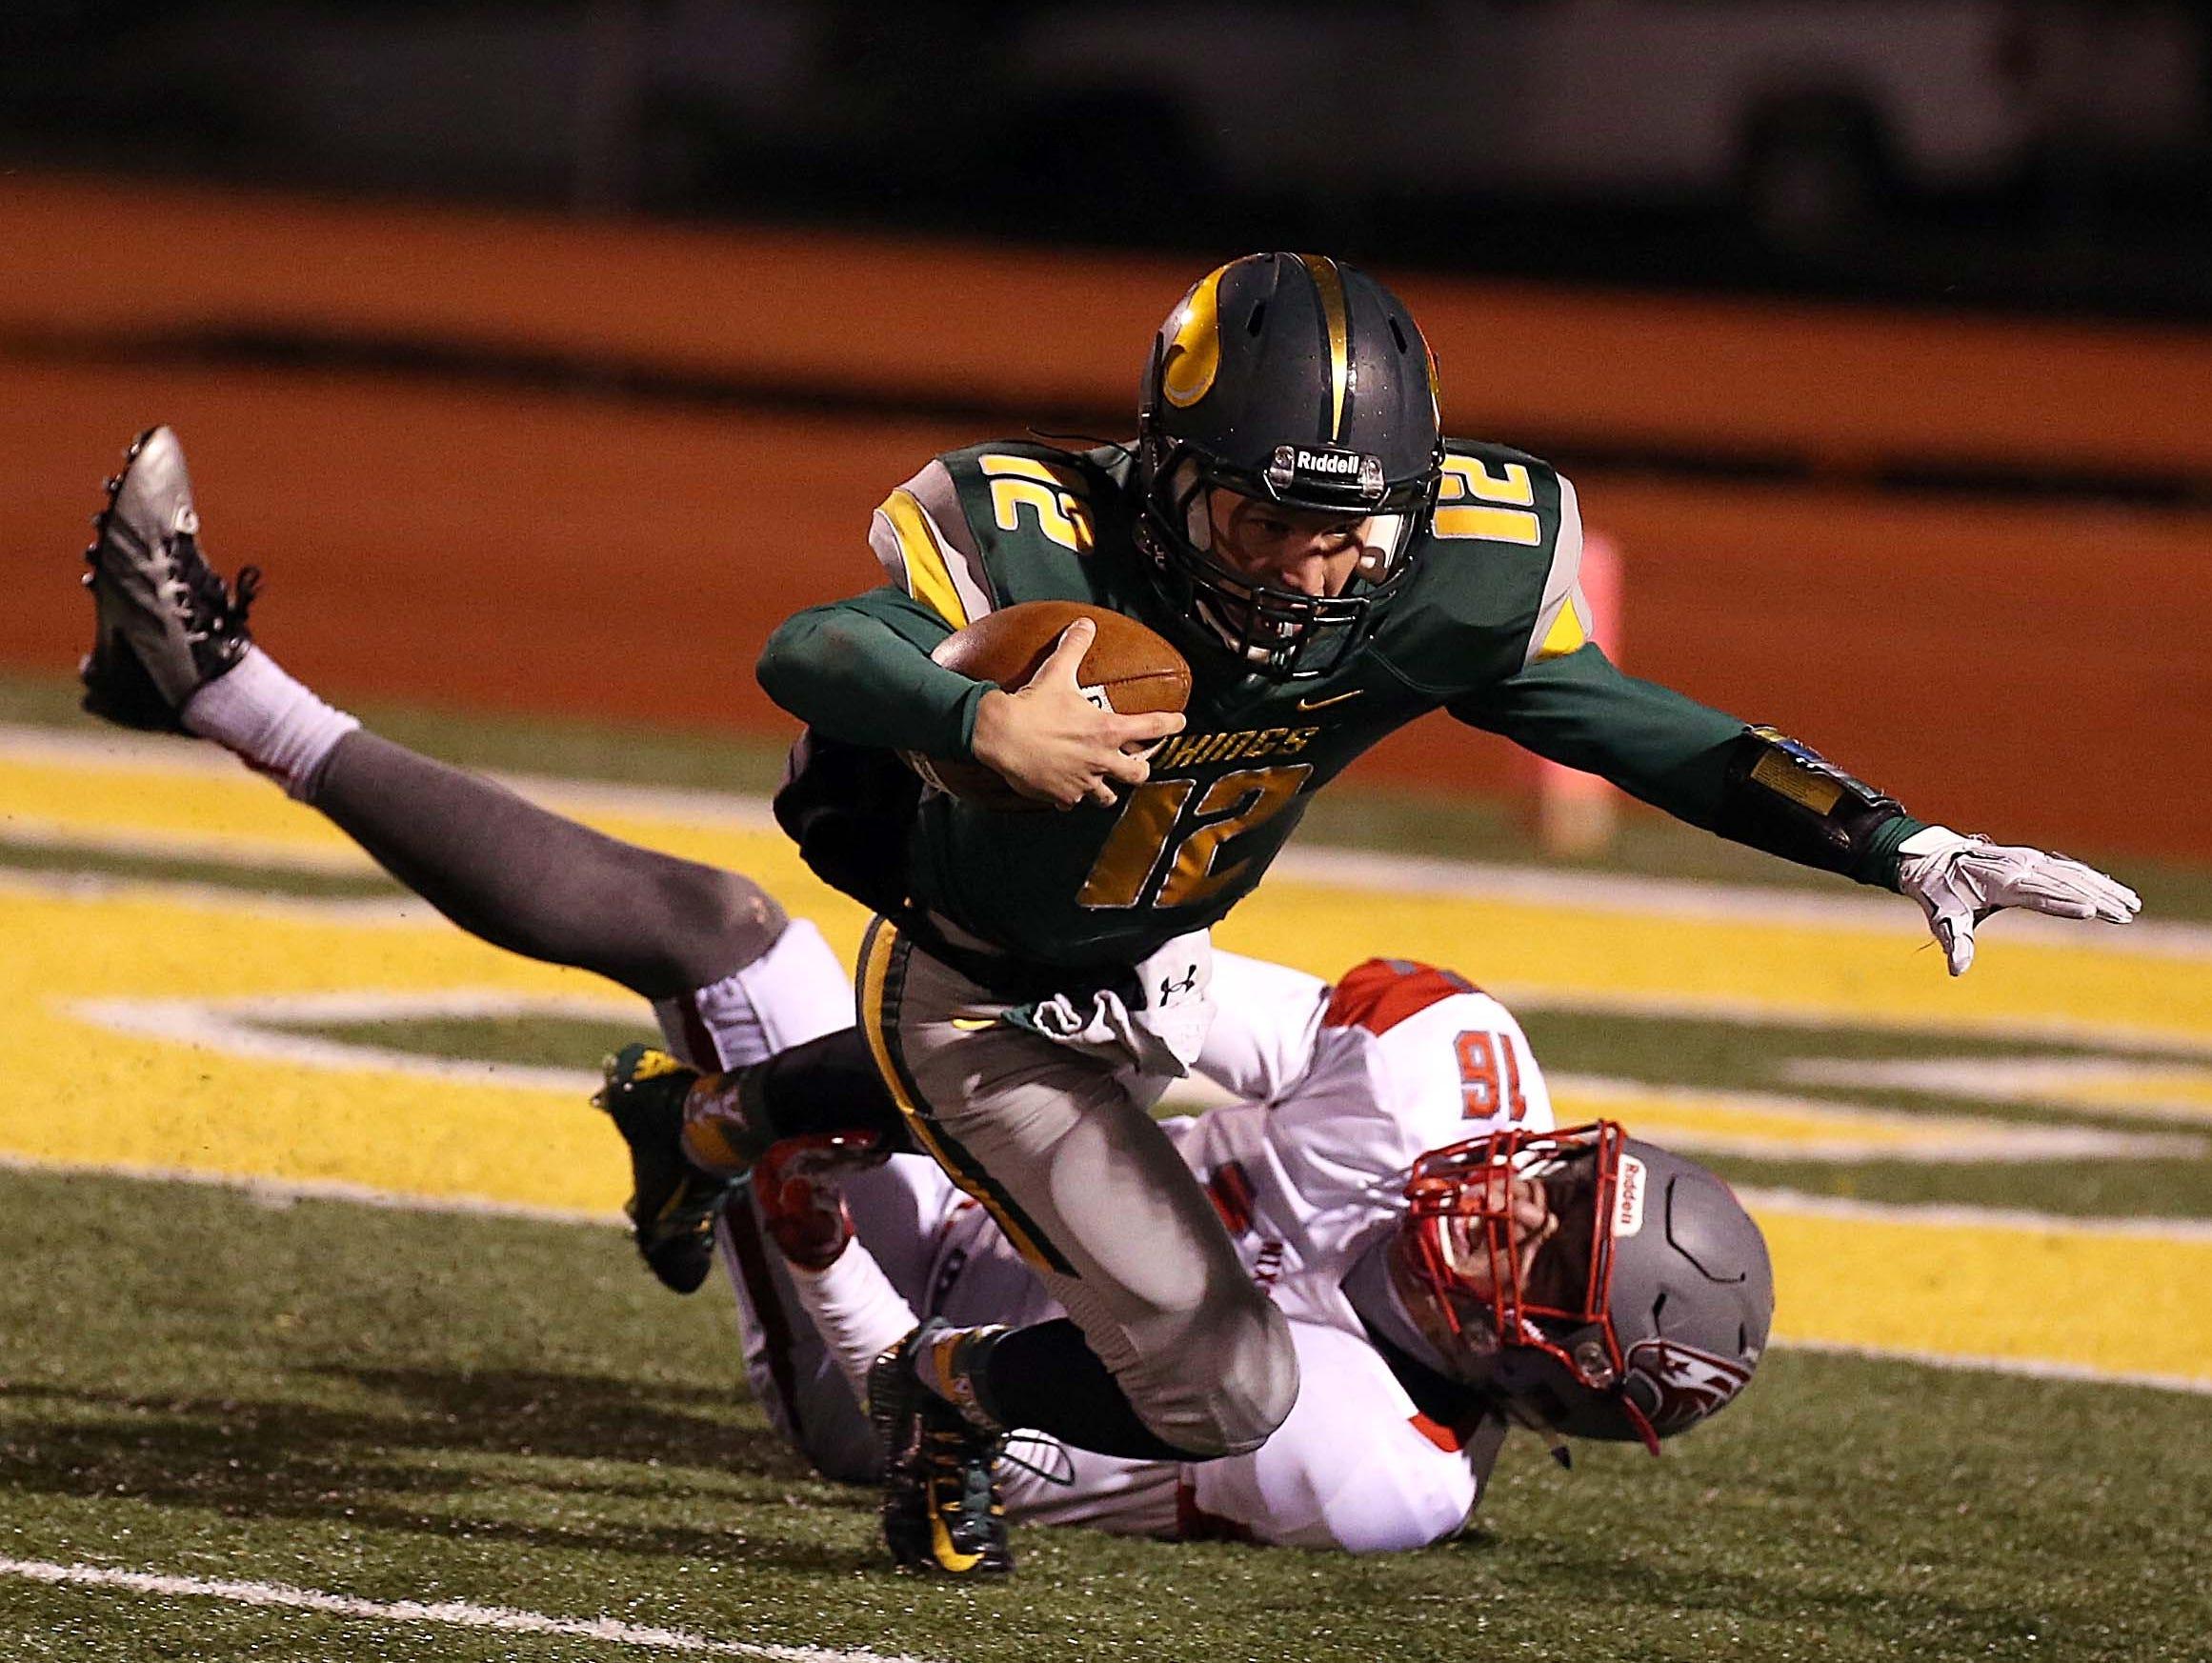 Nixa's Chase Allen sacks Parkview quarterback Nicholas Cole in Springfield on October 30, 2015.